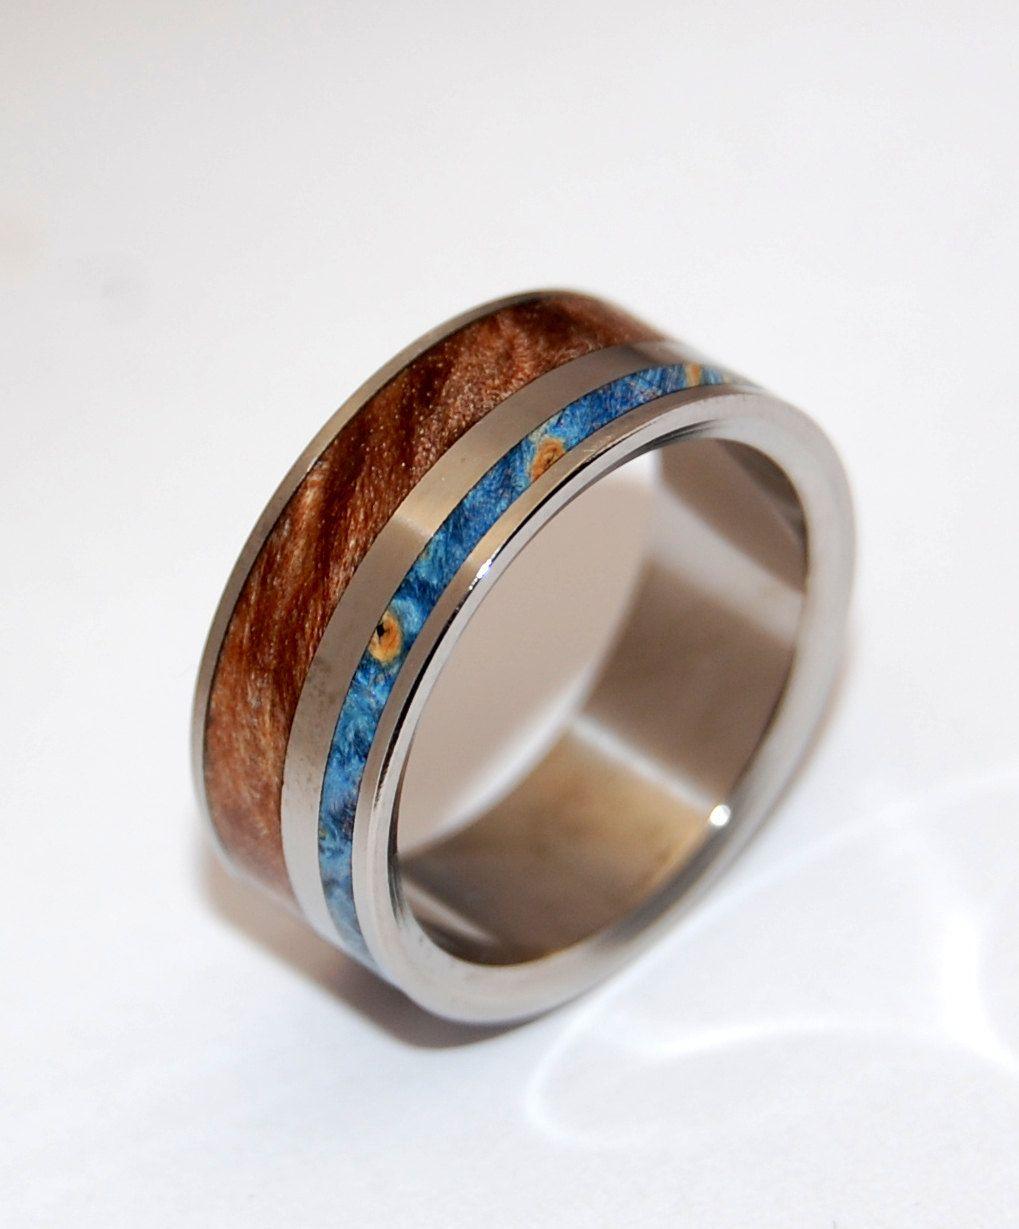 Earth By Water II Wooden Wedding Rings 27500 via Etsy